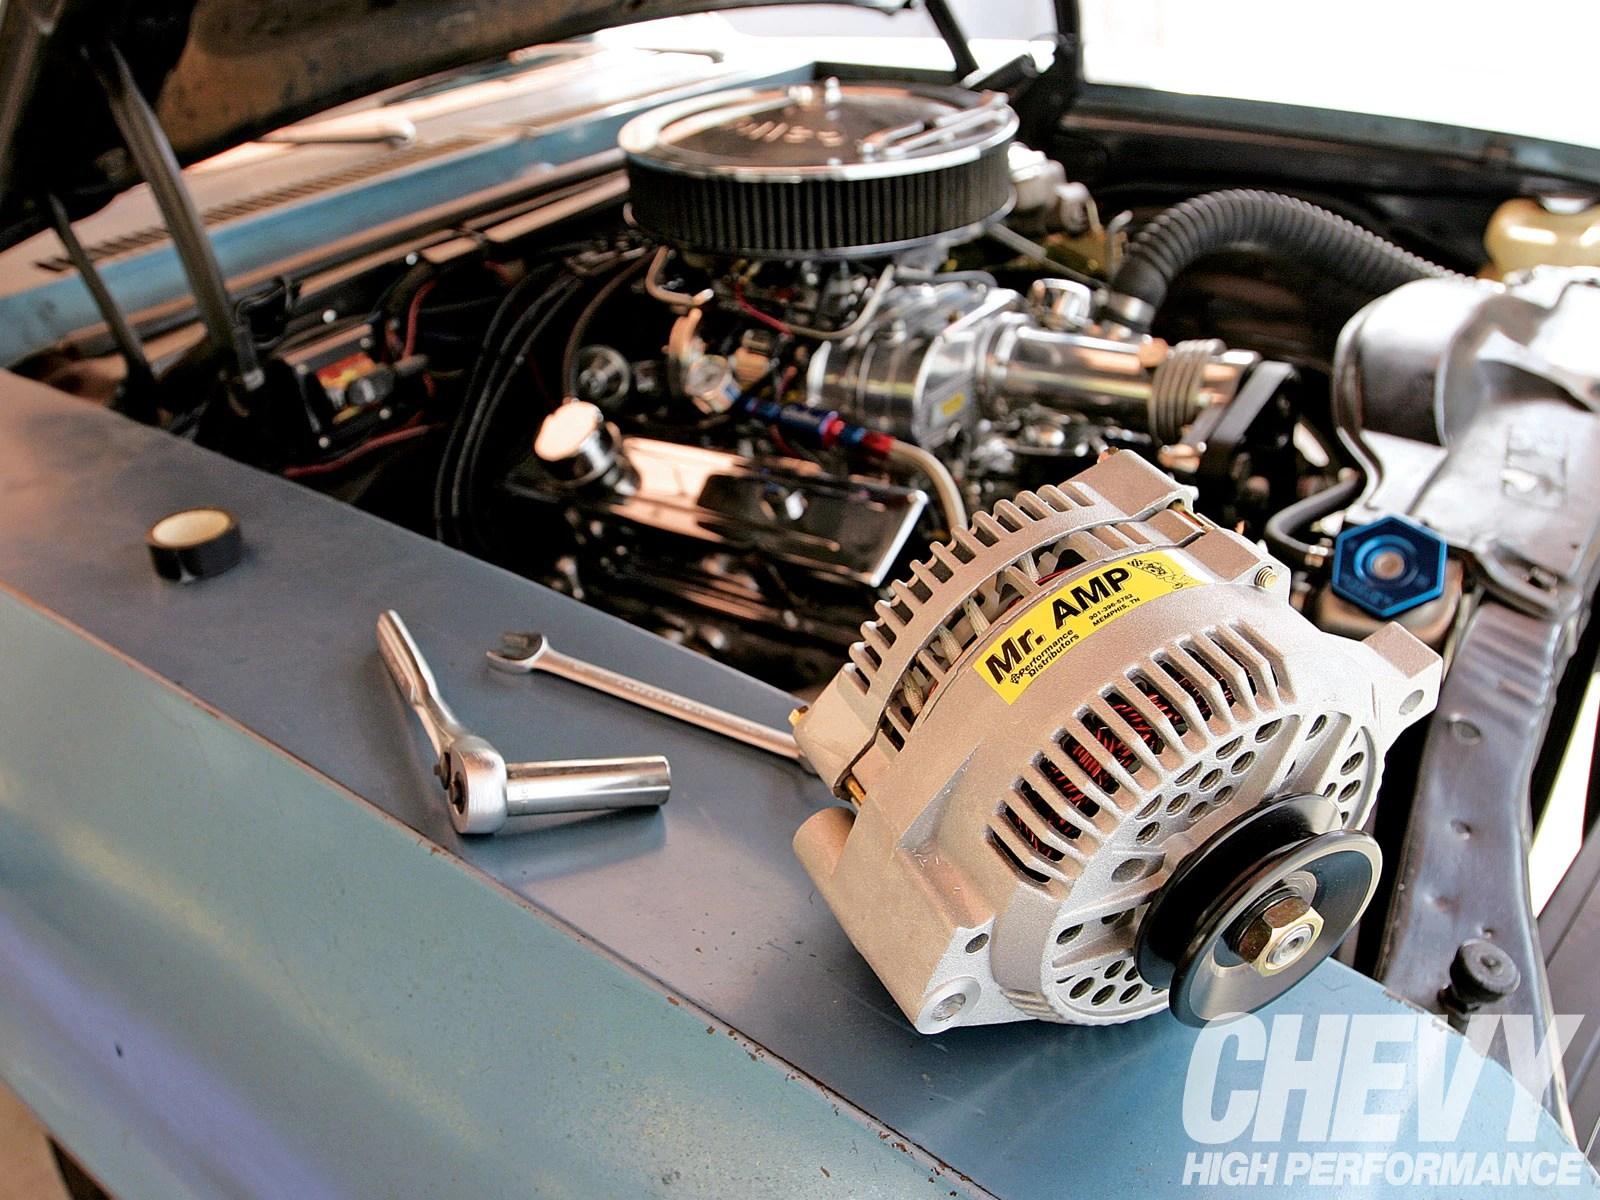 hight resolution of 1972 chevy nova alternator replacement chevy high performance magazine 3 wire gm alternator wiring diagram 1972 chevy nova